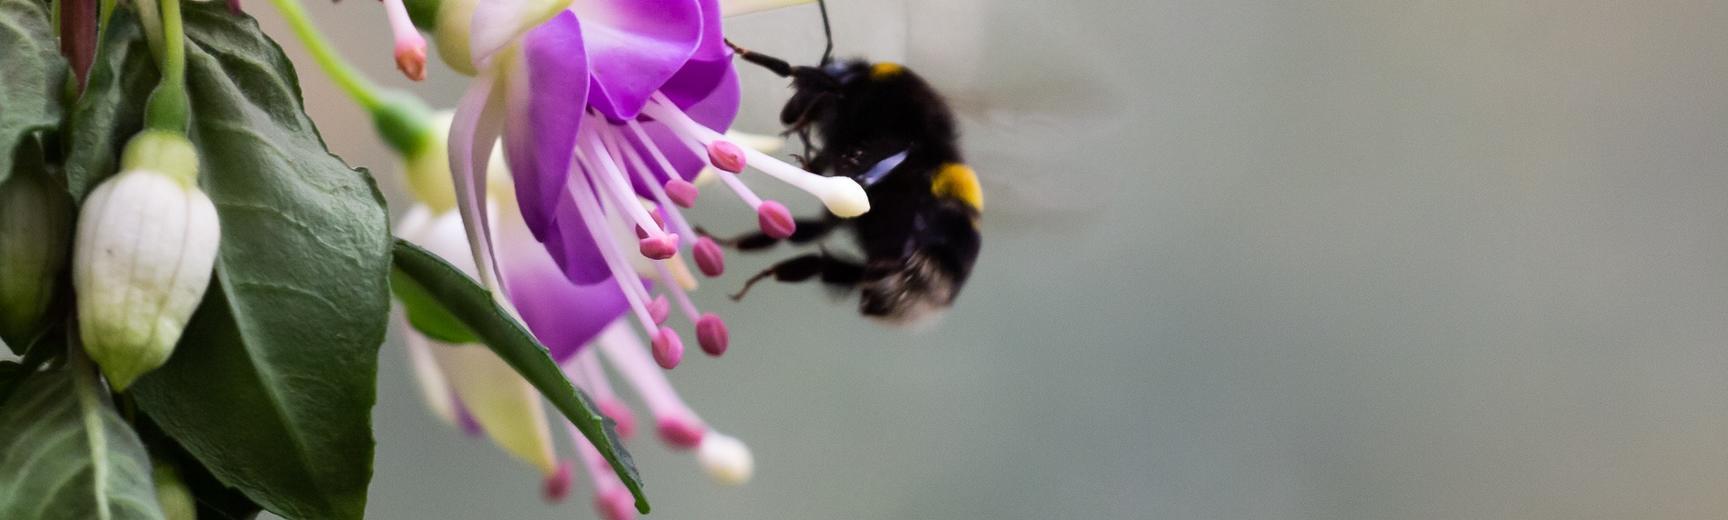 bee fuchsia - Oxford Botanic Garden